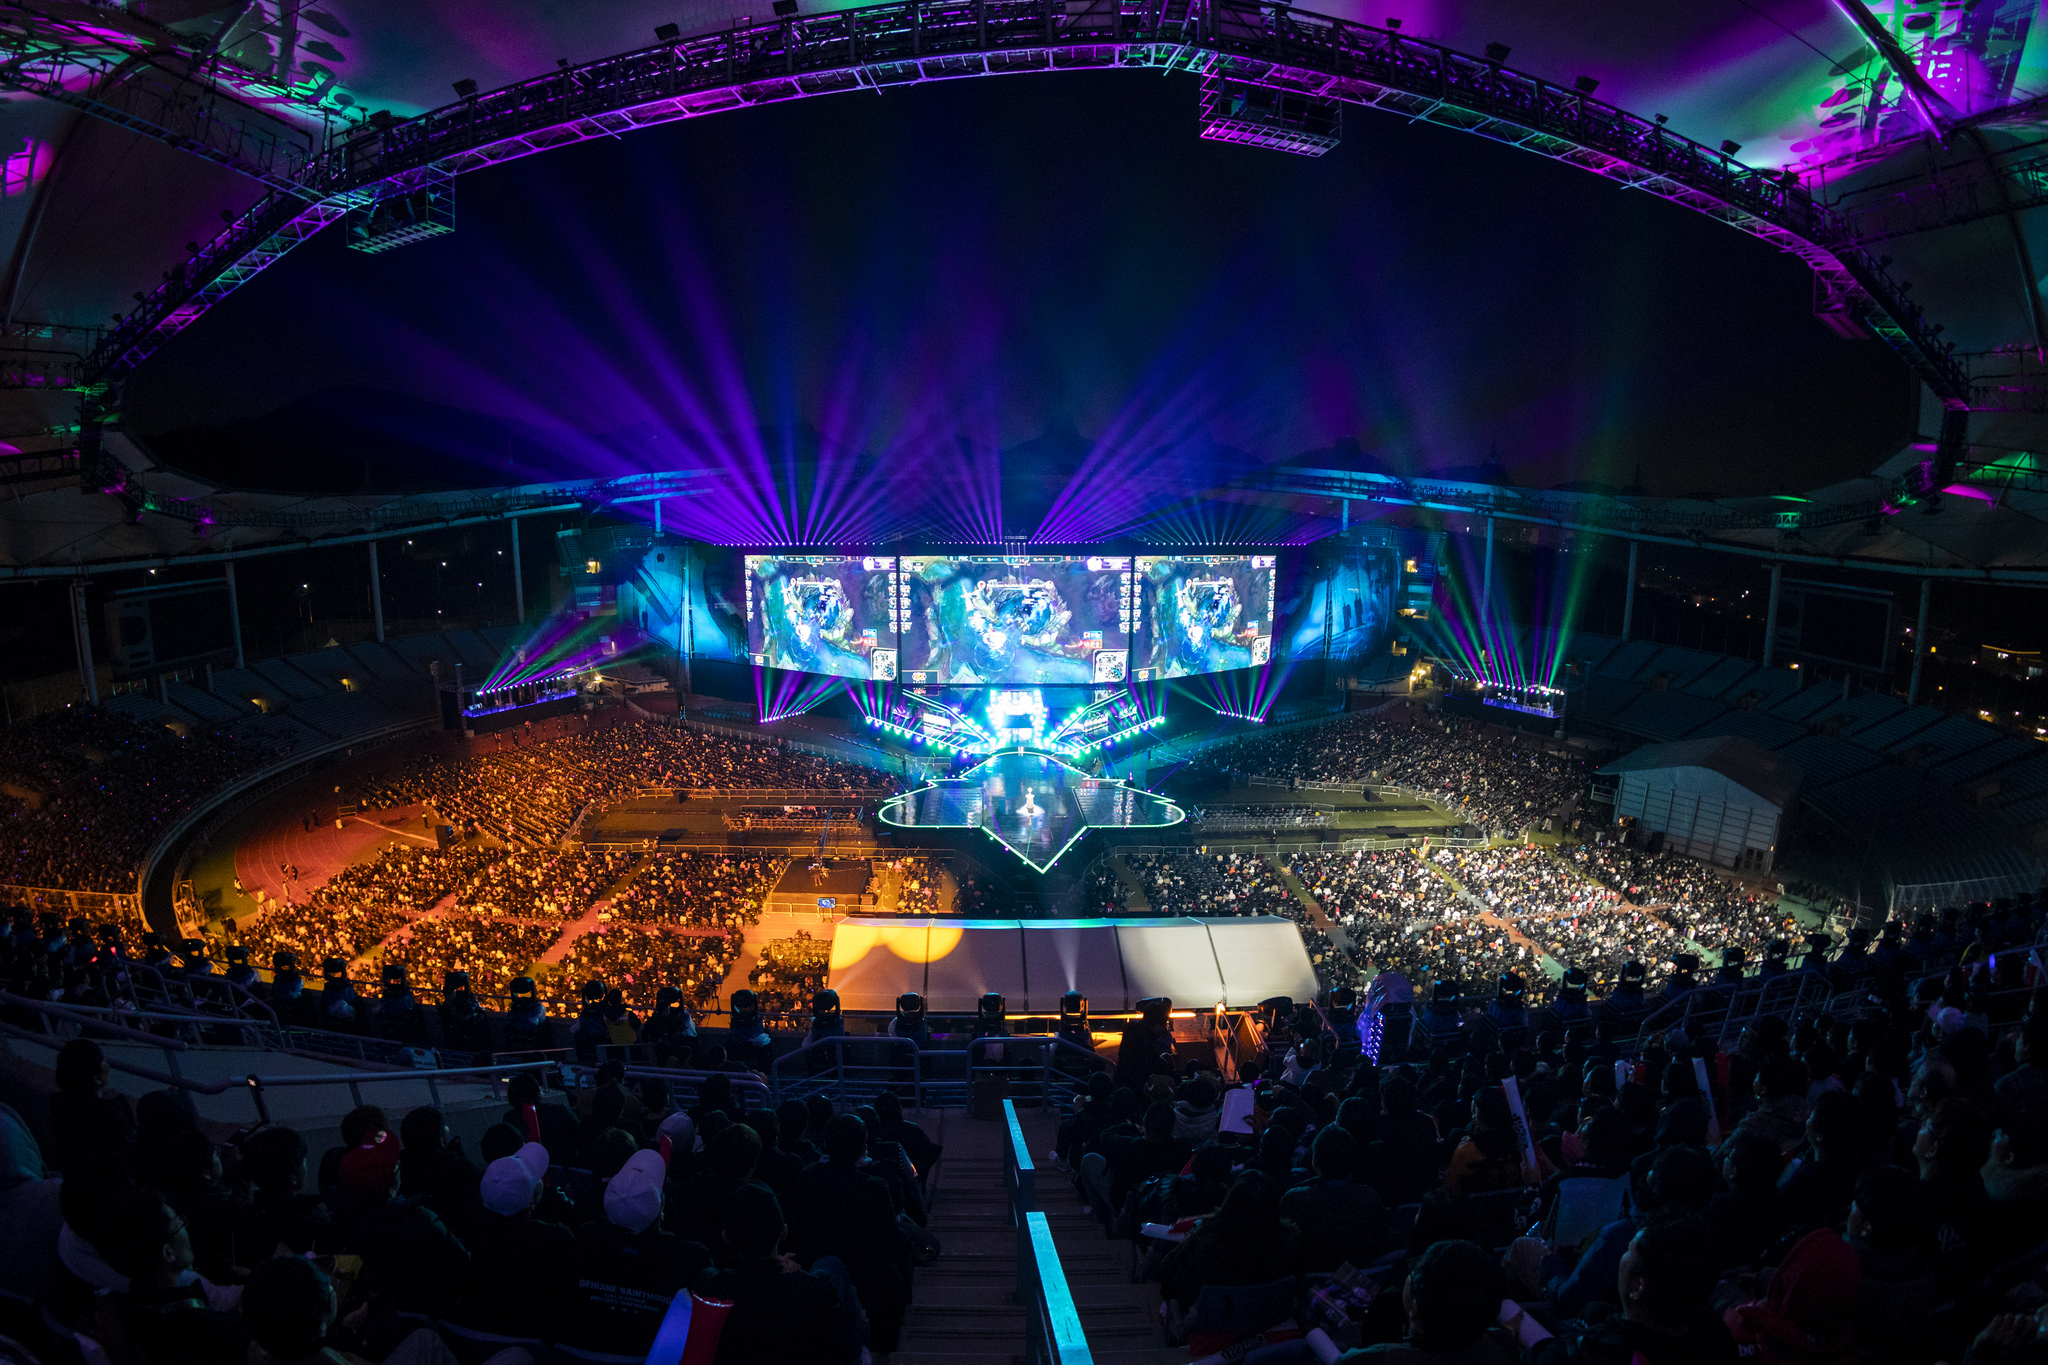 Dark Horse Teams To Watch At Worlds 2020 Dot Esports